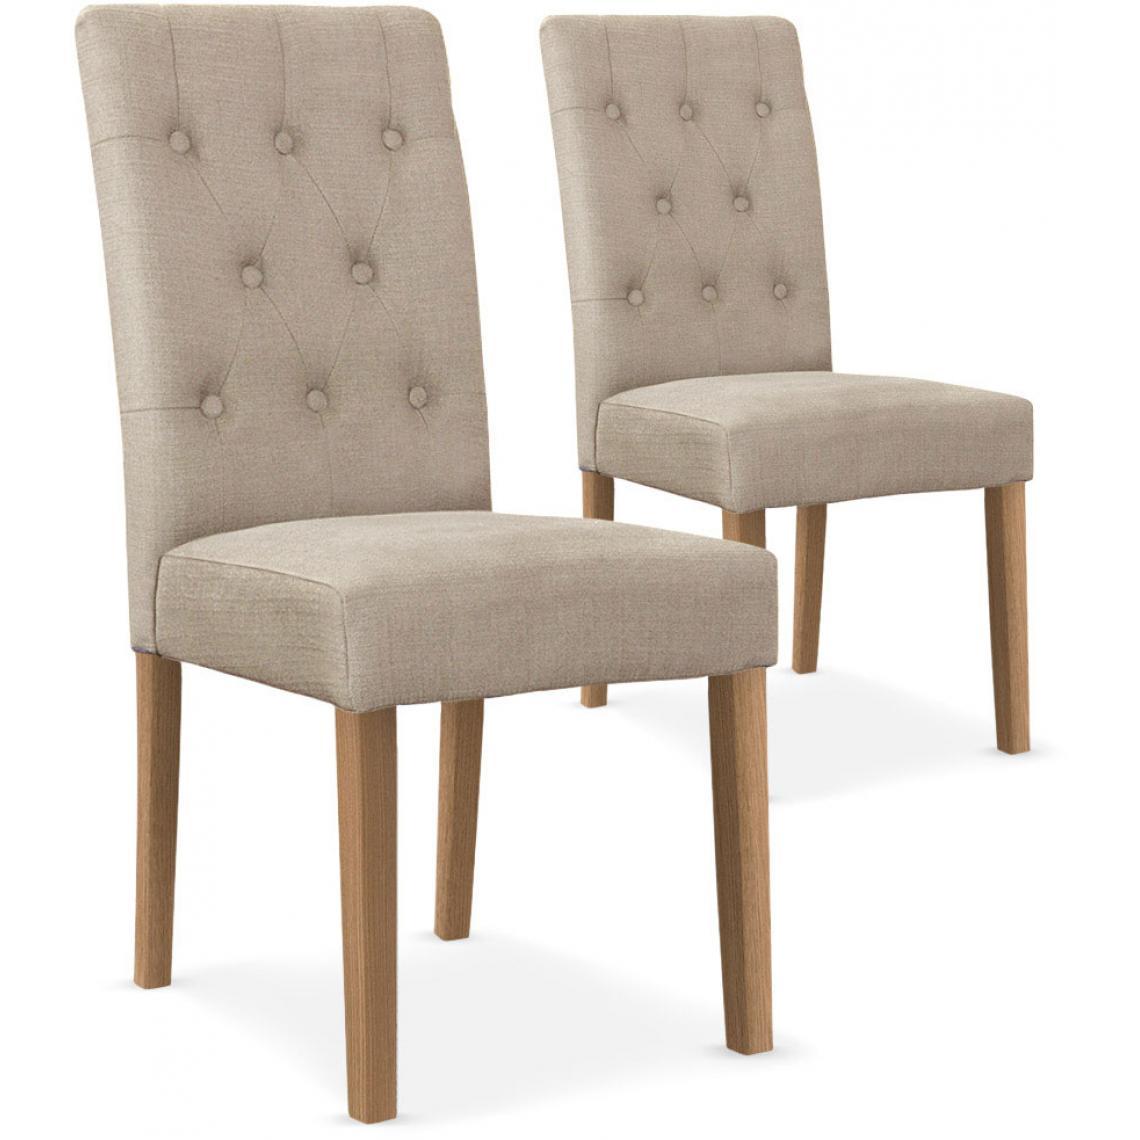 lot de 2 chaises capitonnee tissu beige costa